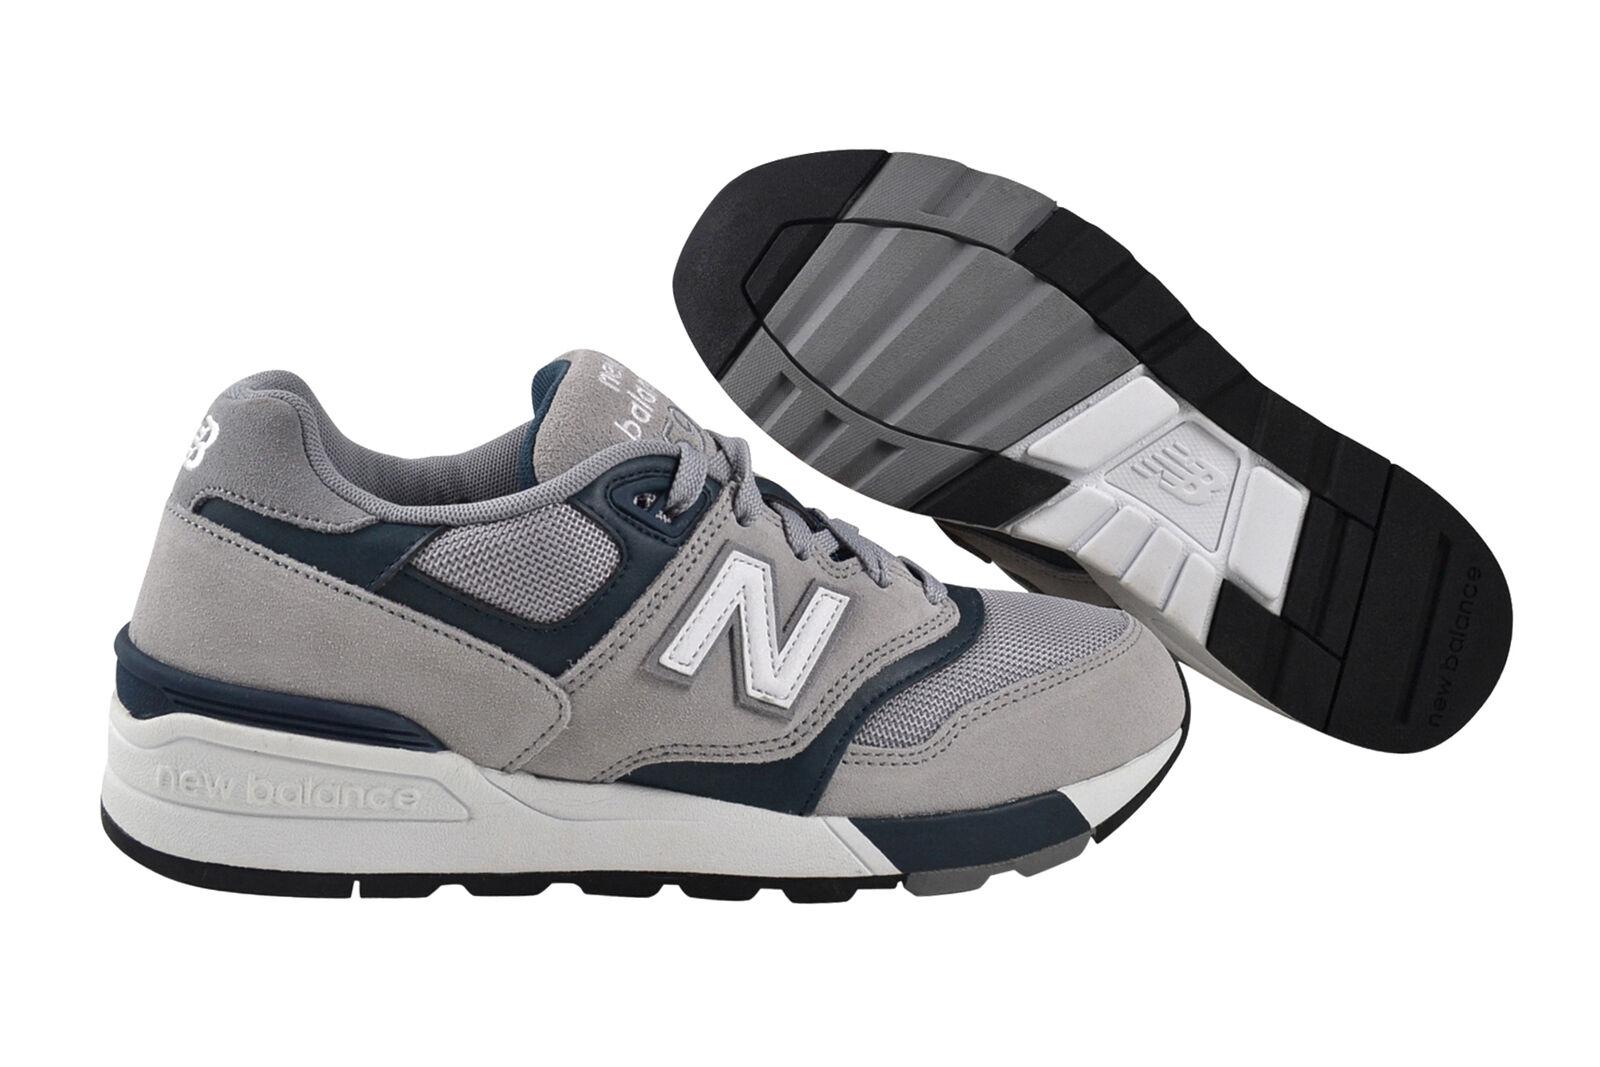 New Balance Zapatos ML597 GSC Gris teal Zapatos Balance Sneaker grau 87fa85